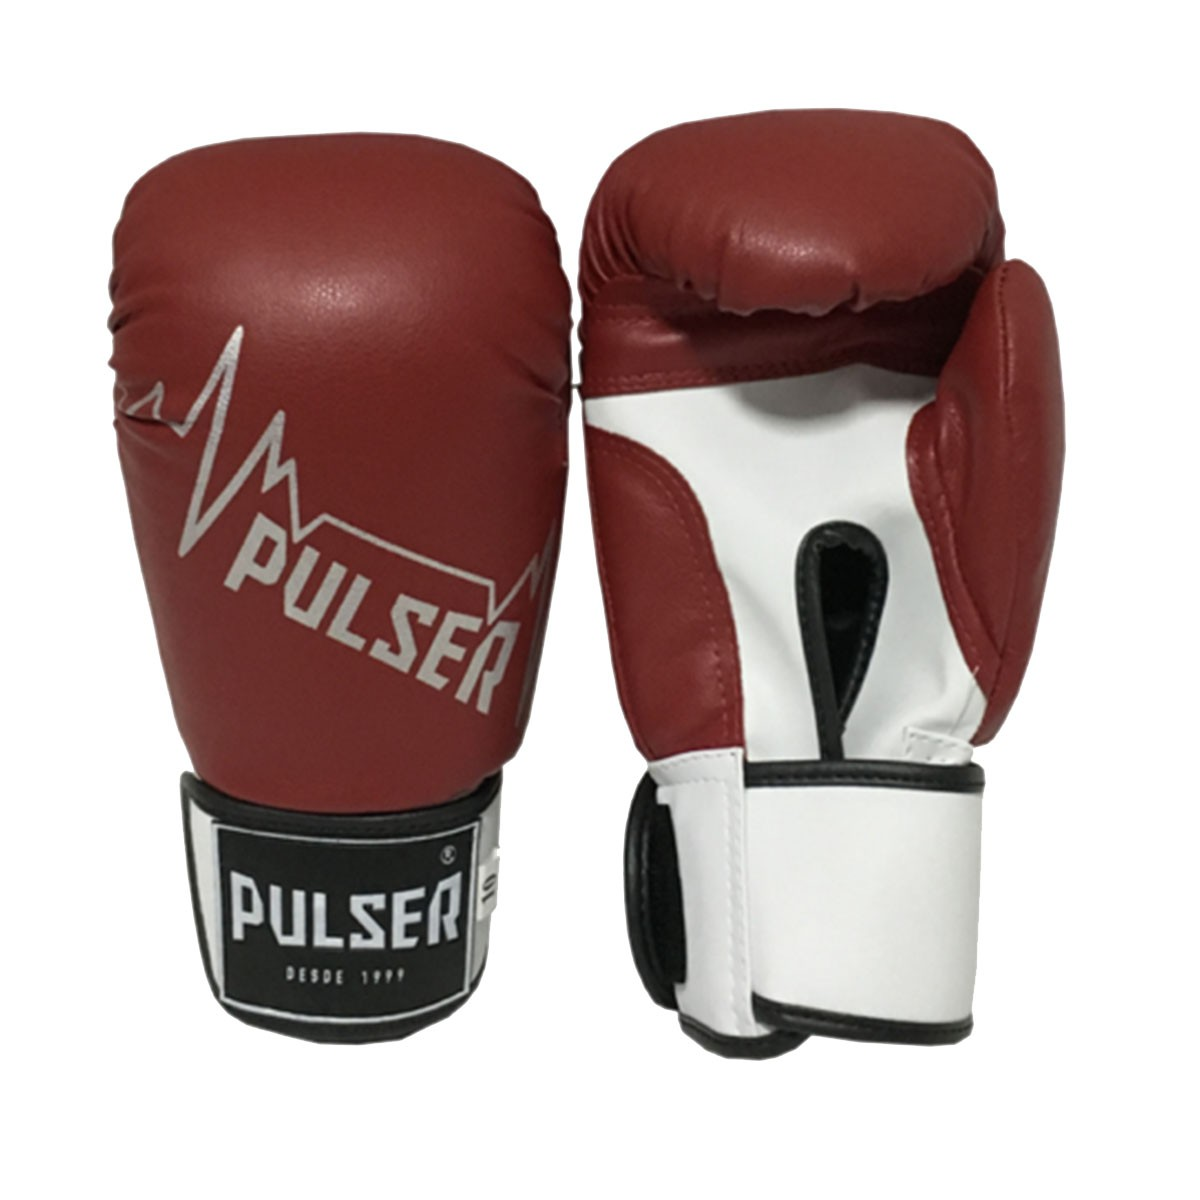 Kit de Boxe / Muay Thai 14oz - Vermelho Pulsar - Pulser  - PRALUTA SHOP